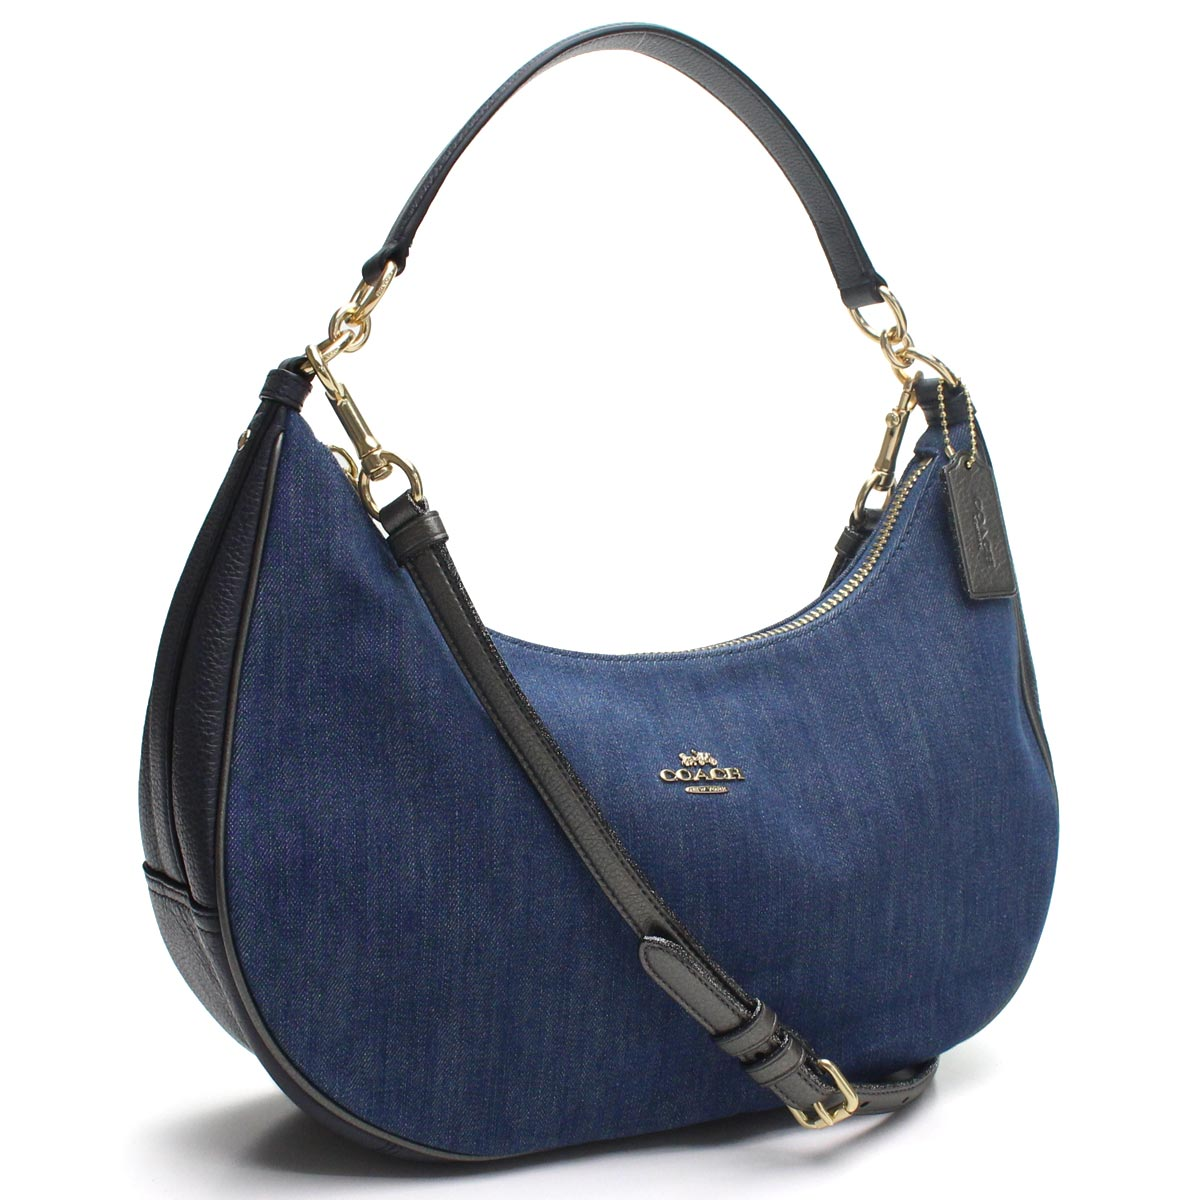 Bighit The total brand wholesale  Coach COACH denim semi-shoulder bag one  shoulder F26157 IMDEI blue system  228ef2187365b